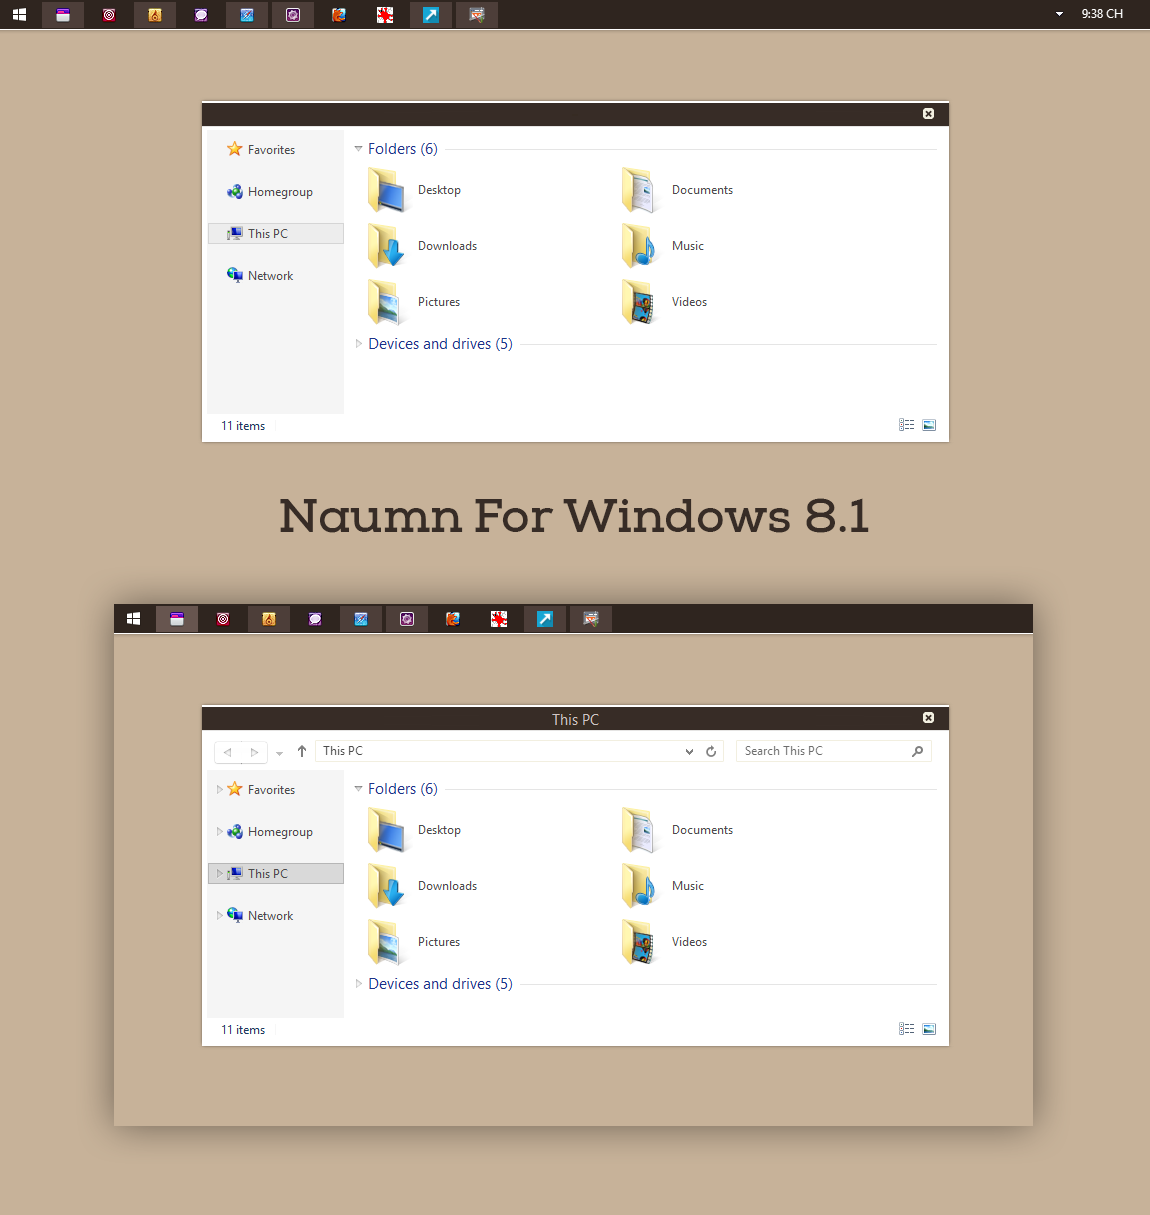 Naumn For Windows 8.1 by cu88